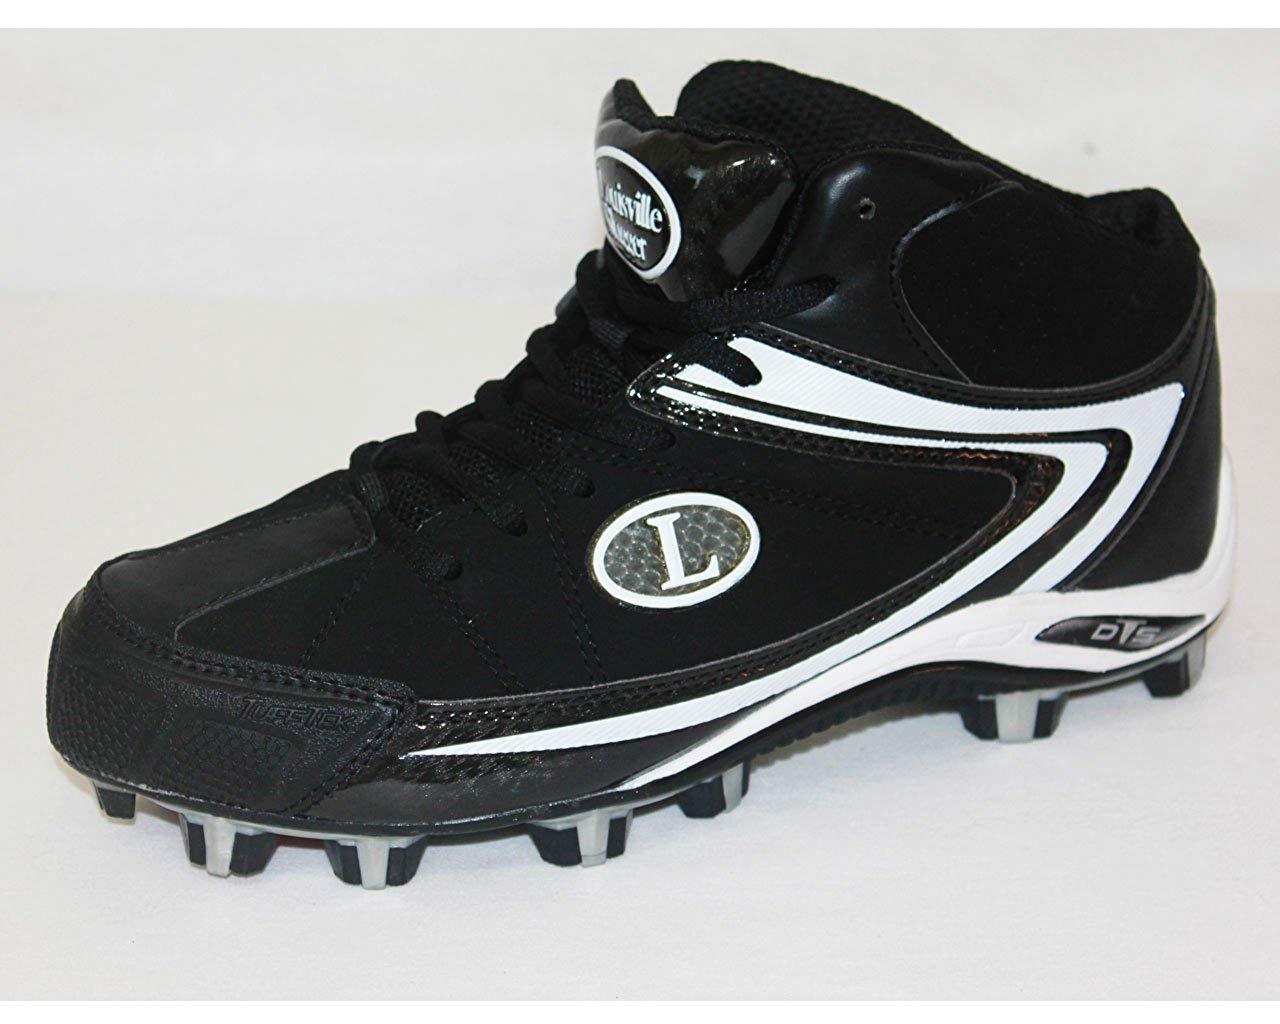 best authentic a90fe d60ea Get Quotations · Louisville Slugger Mens Athletic Baseball Cleats-Size 9.5